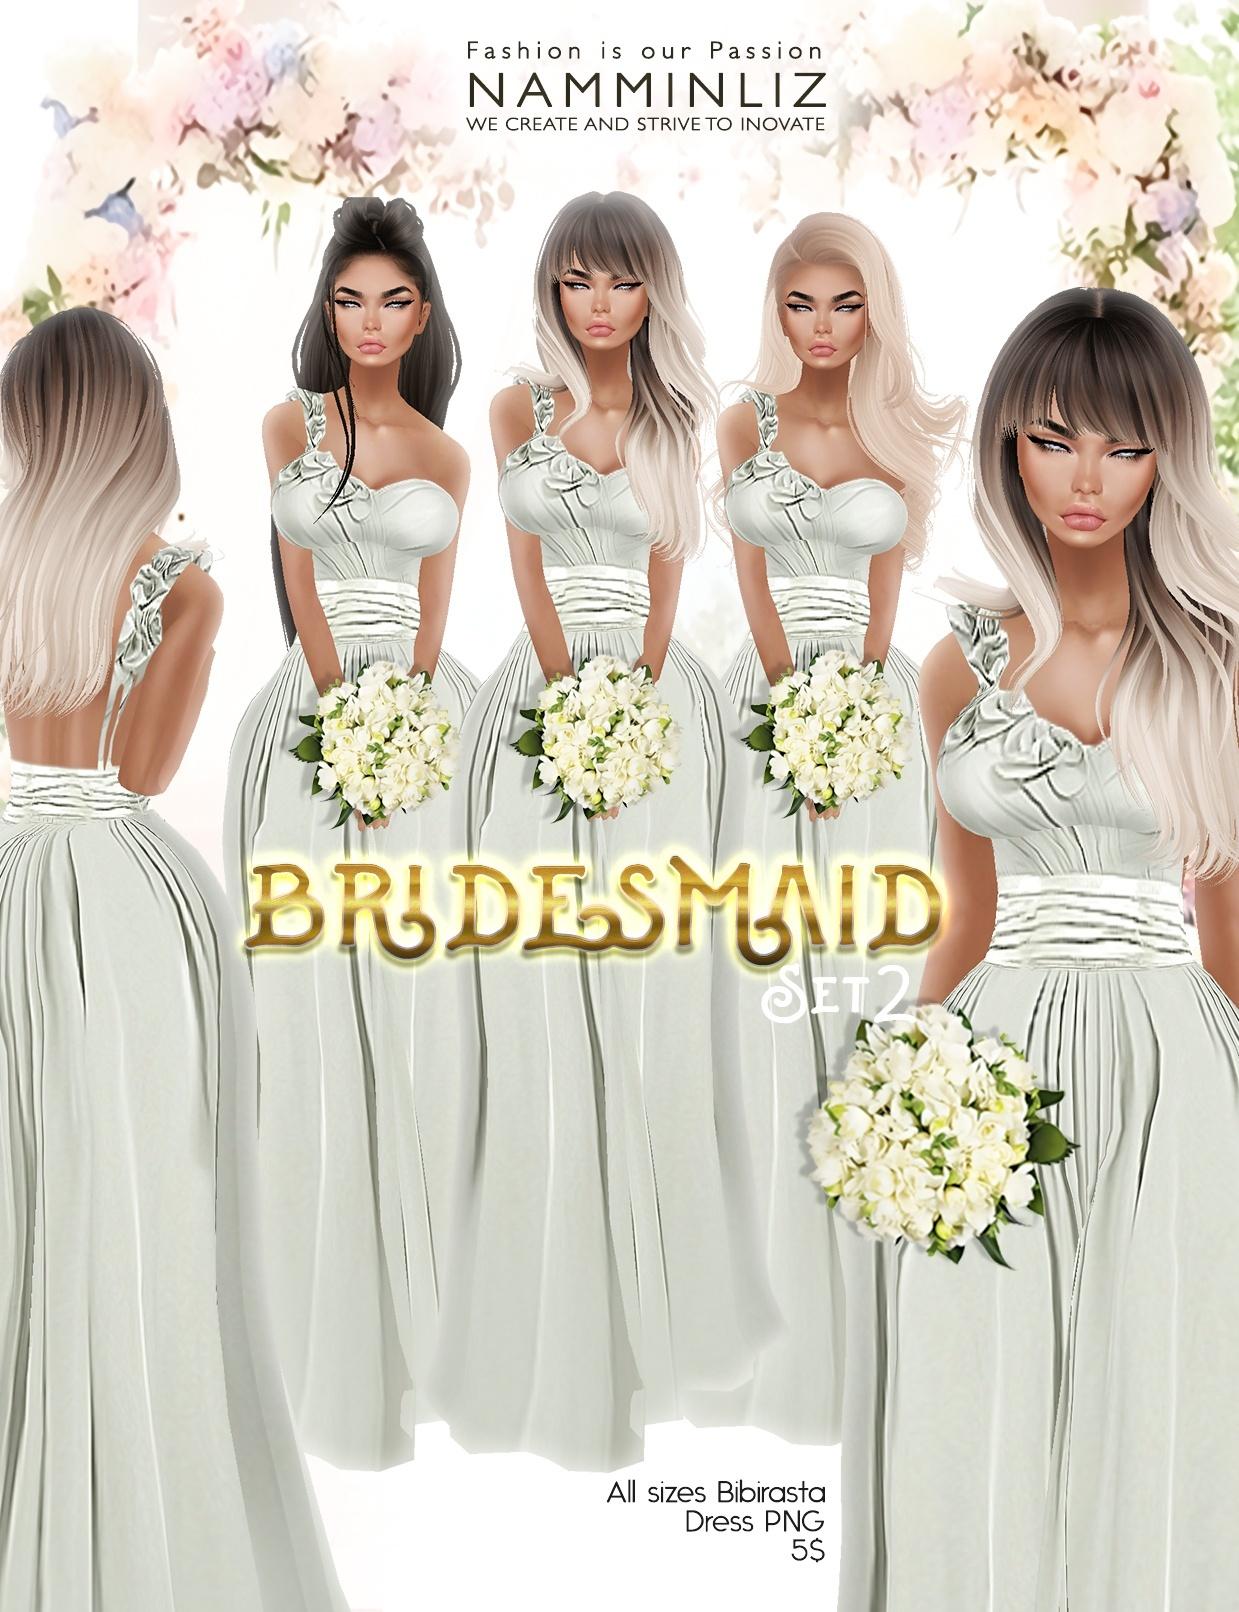 Bridesmaid Full set imvu Bibirasta dress all sizes PNG